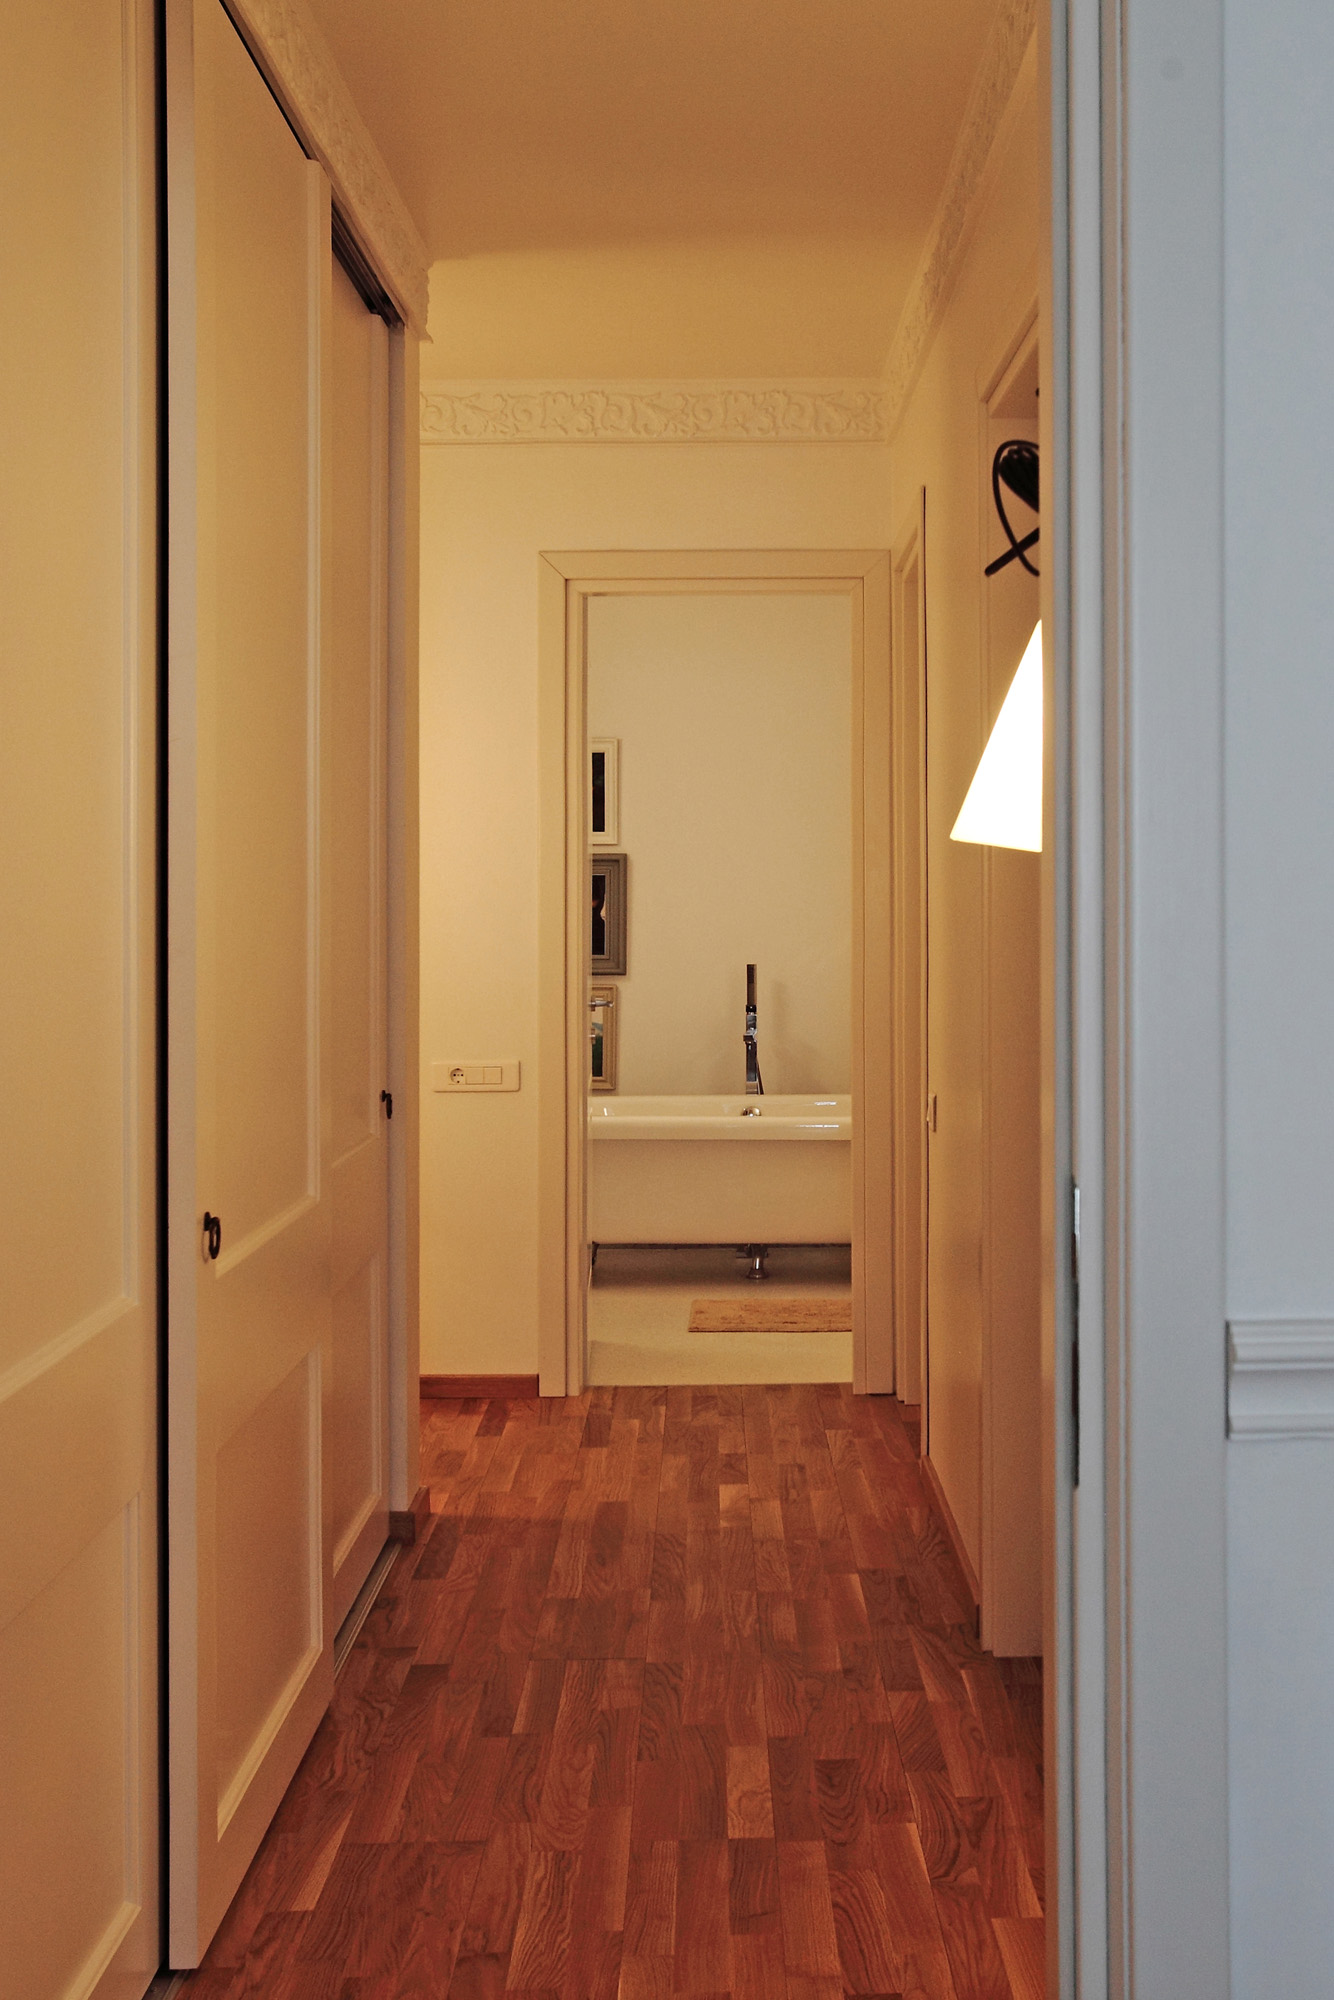 https://ahe-ro.s3.amazonaws.com/12337/apartament-elegant-cu-4-camere-si-terase-generoase-in-centrul-bucurestiului-%288%29.jpg